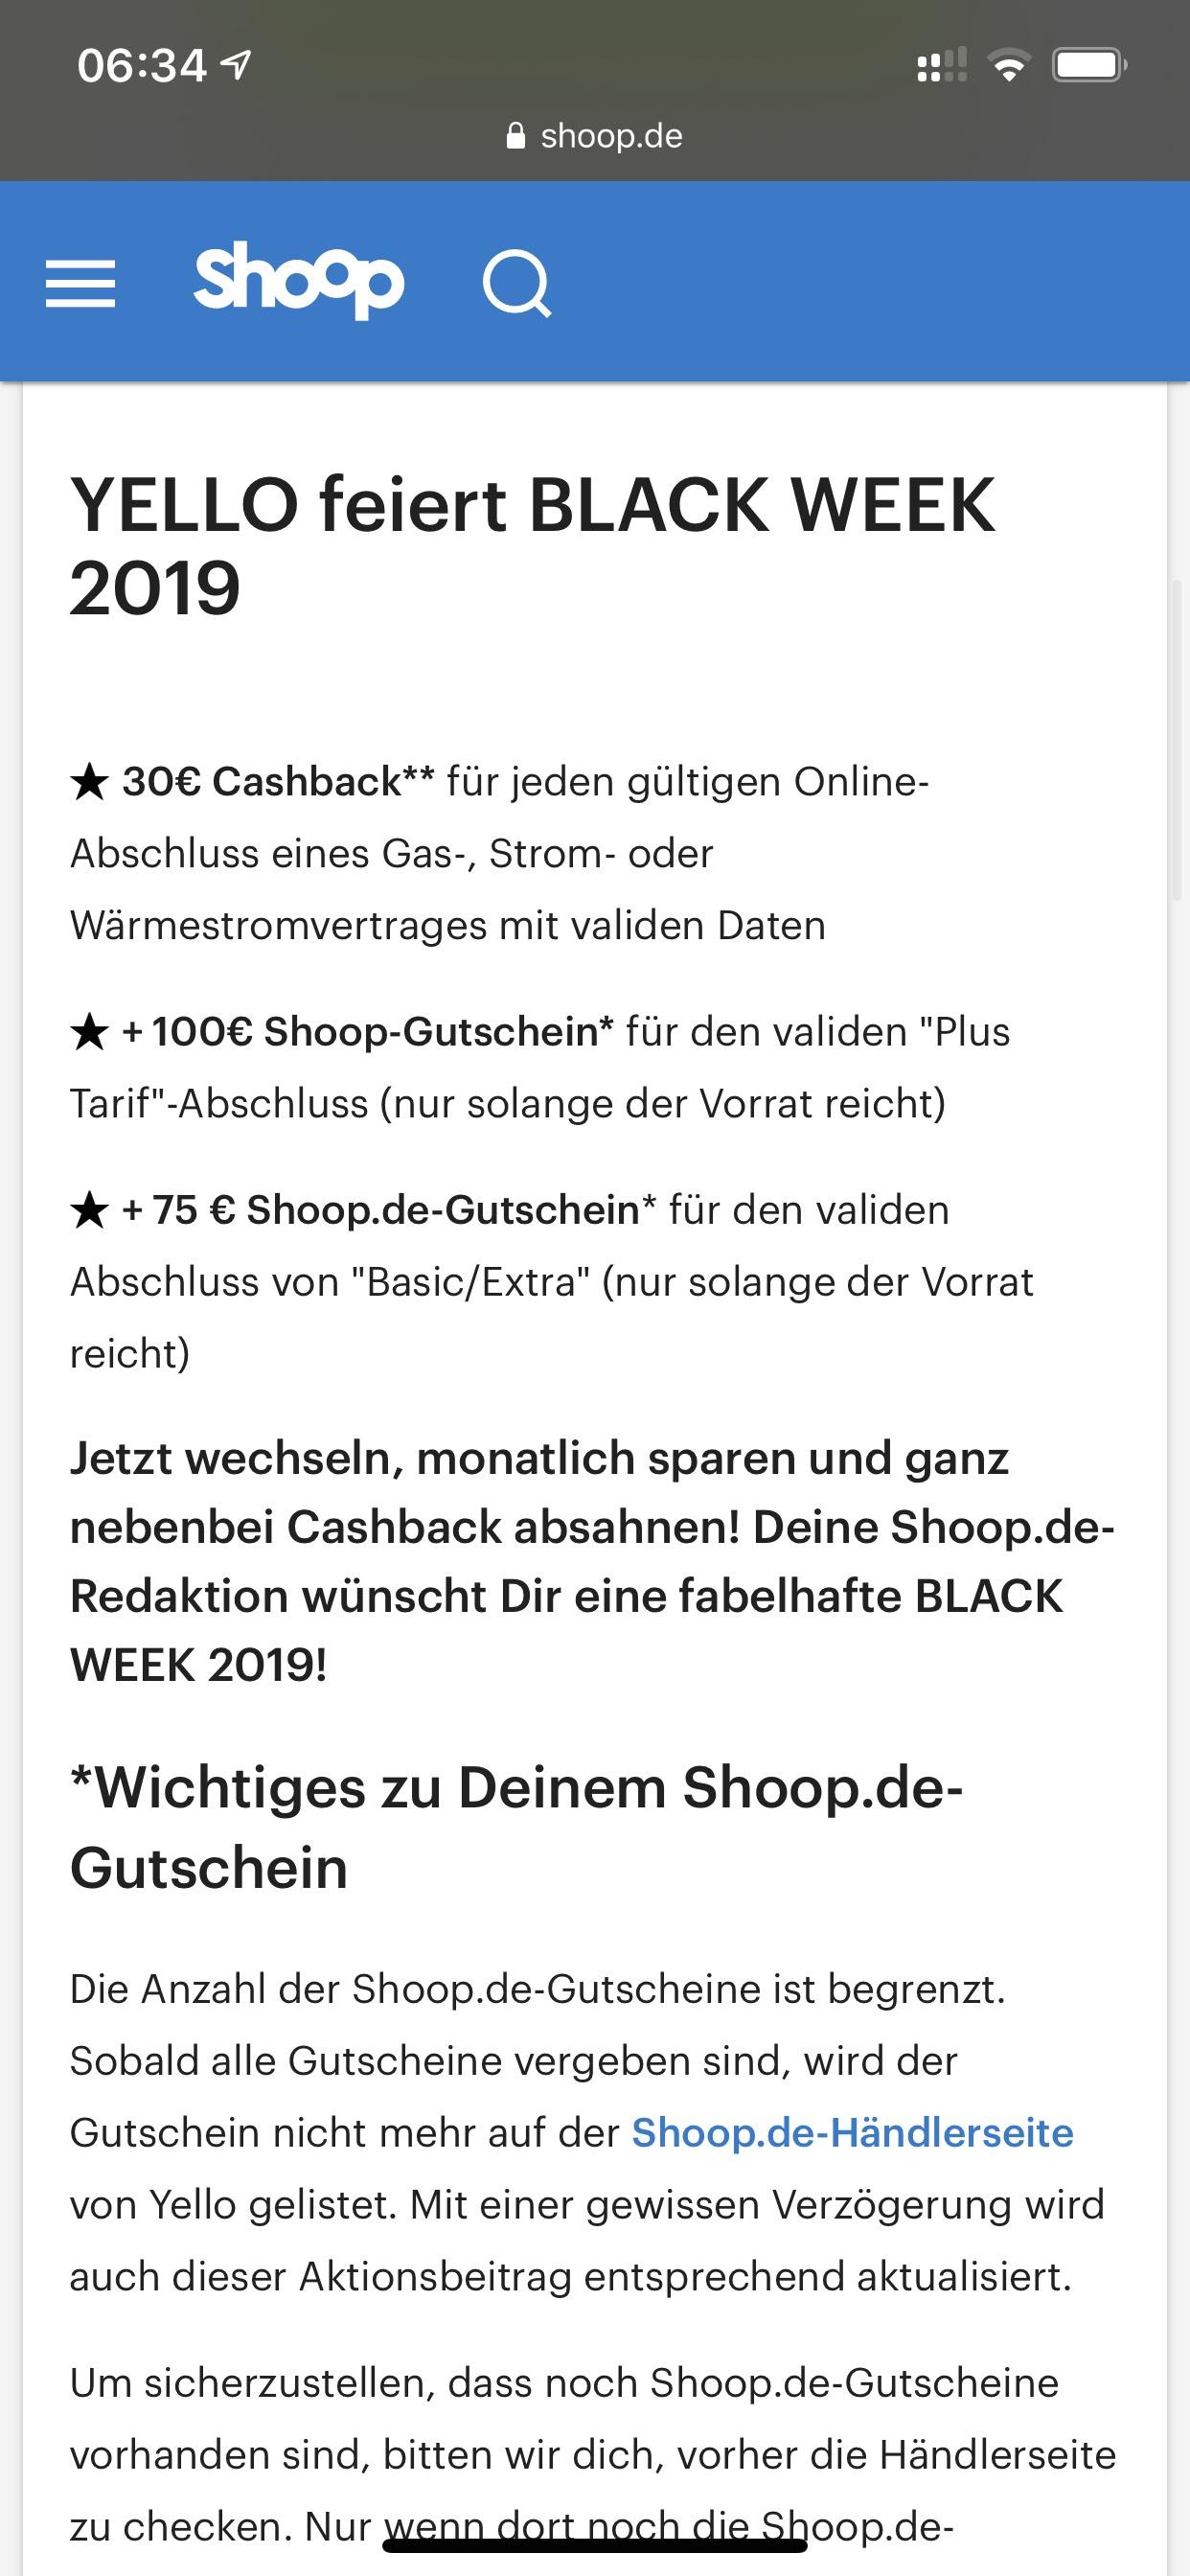 Yello Neukundengutschein 50€ / 100€ & cashback 30€